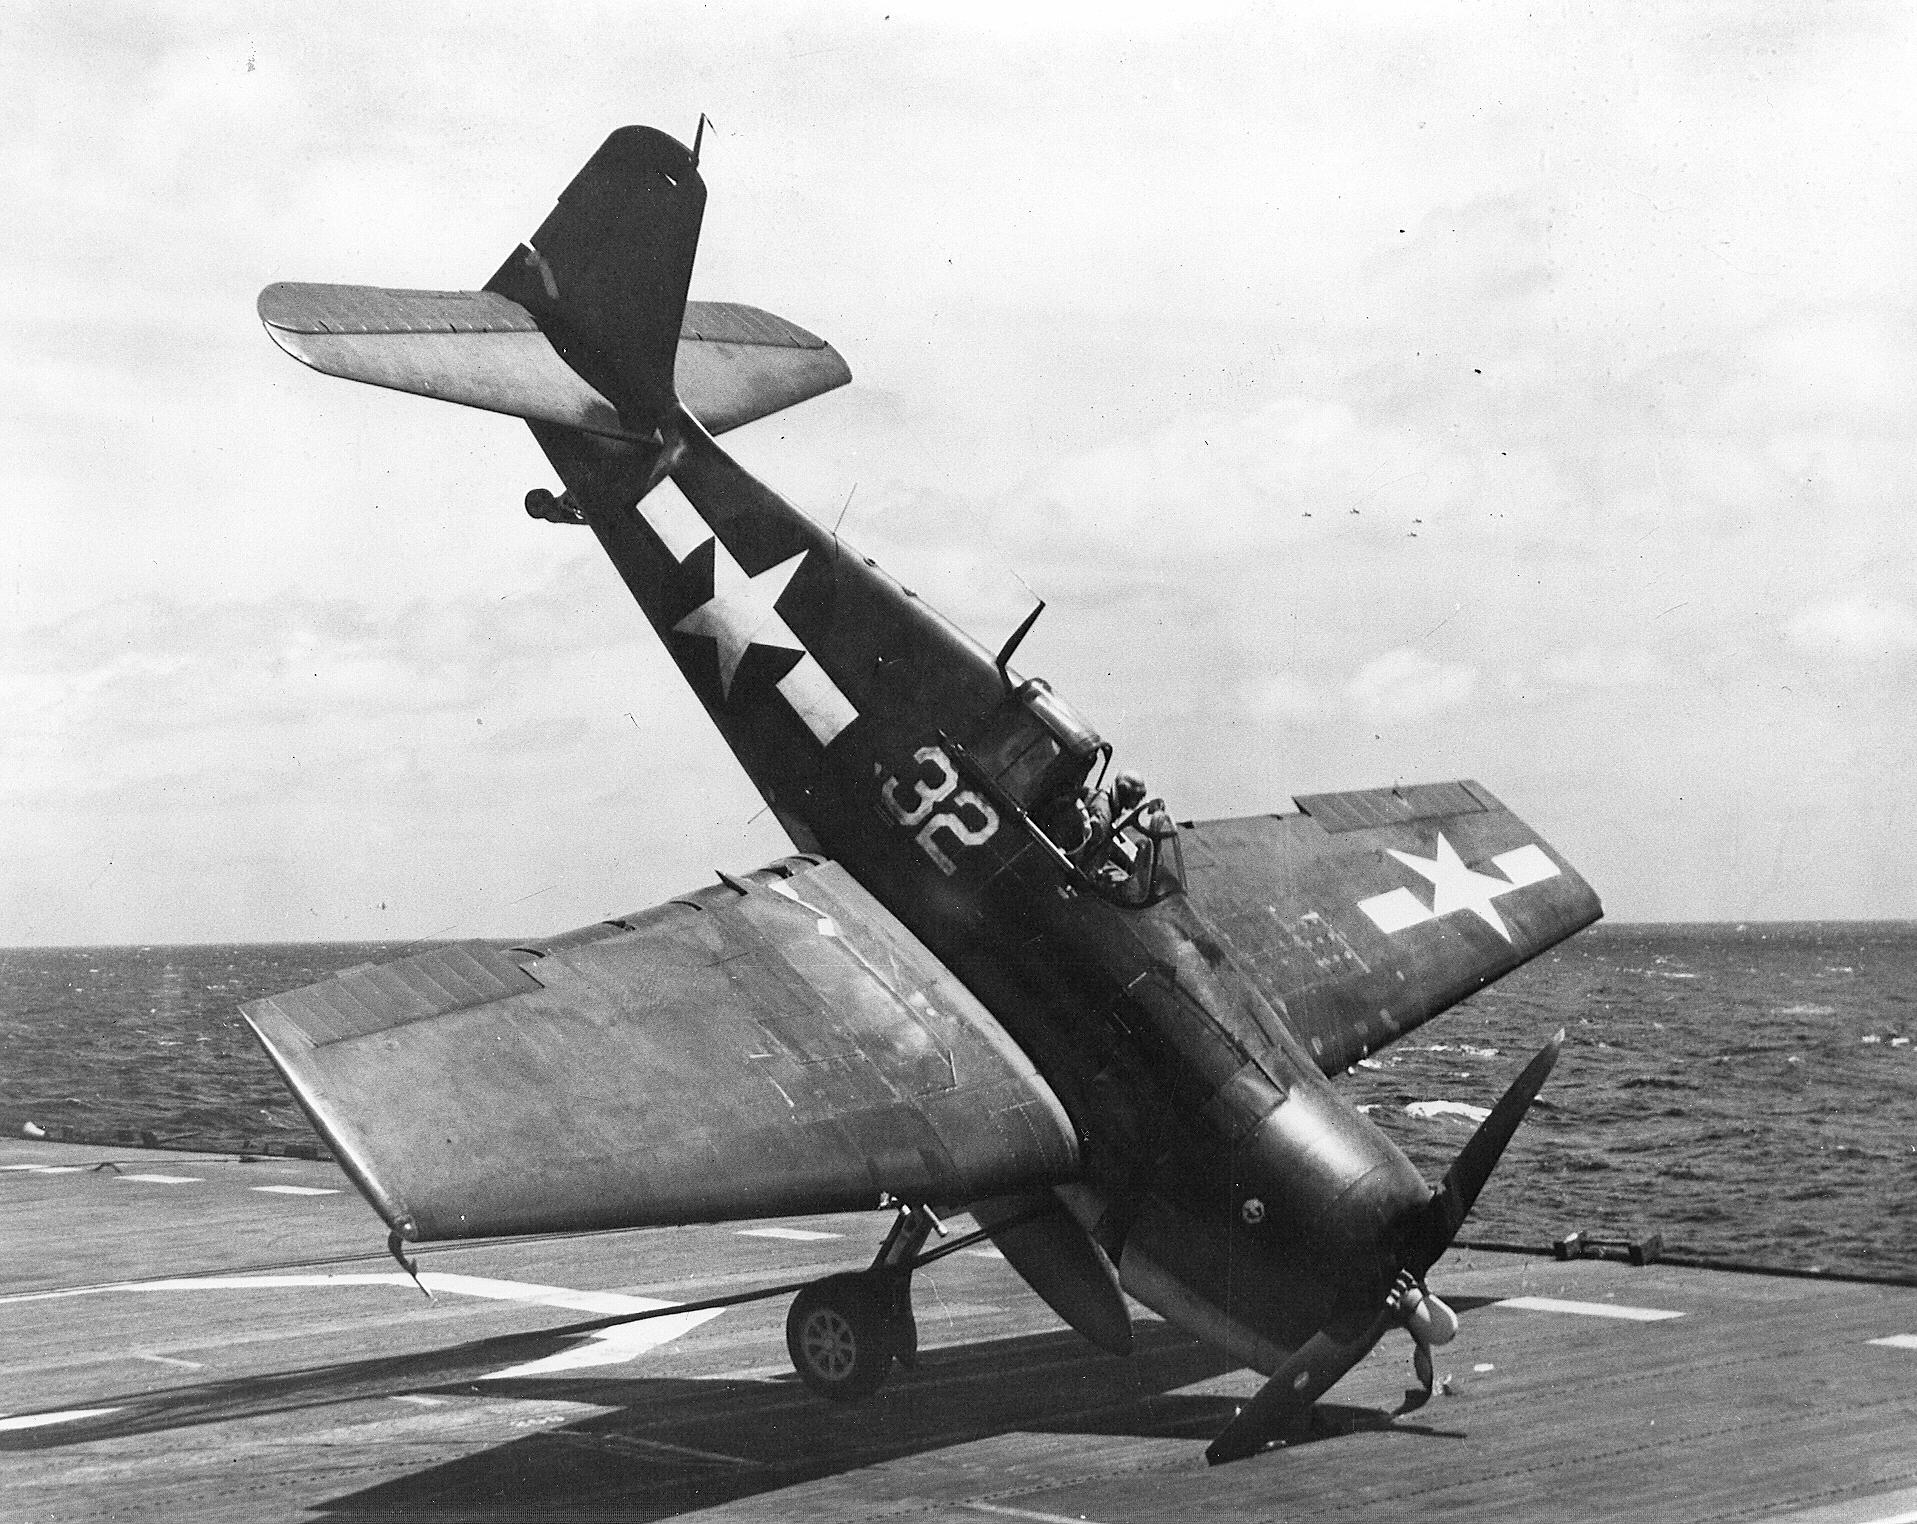 Grumman F6F 3 Hellcat VF 31 White 32 landing mishap CVL 28 USS Cabot 1944 02